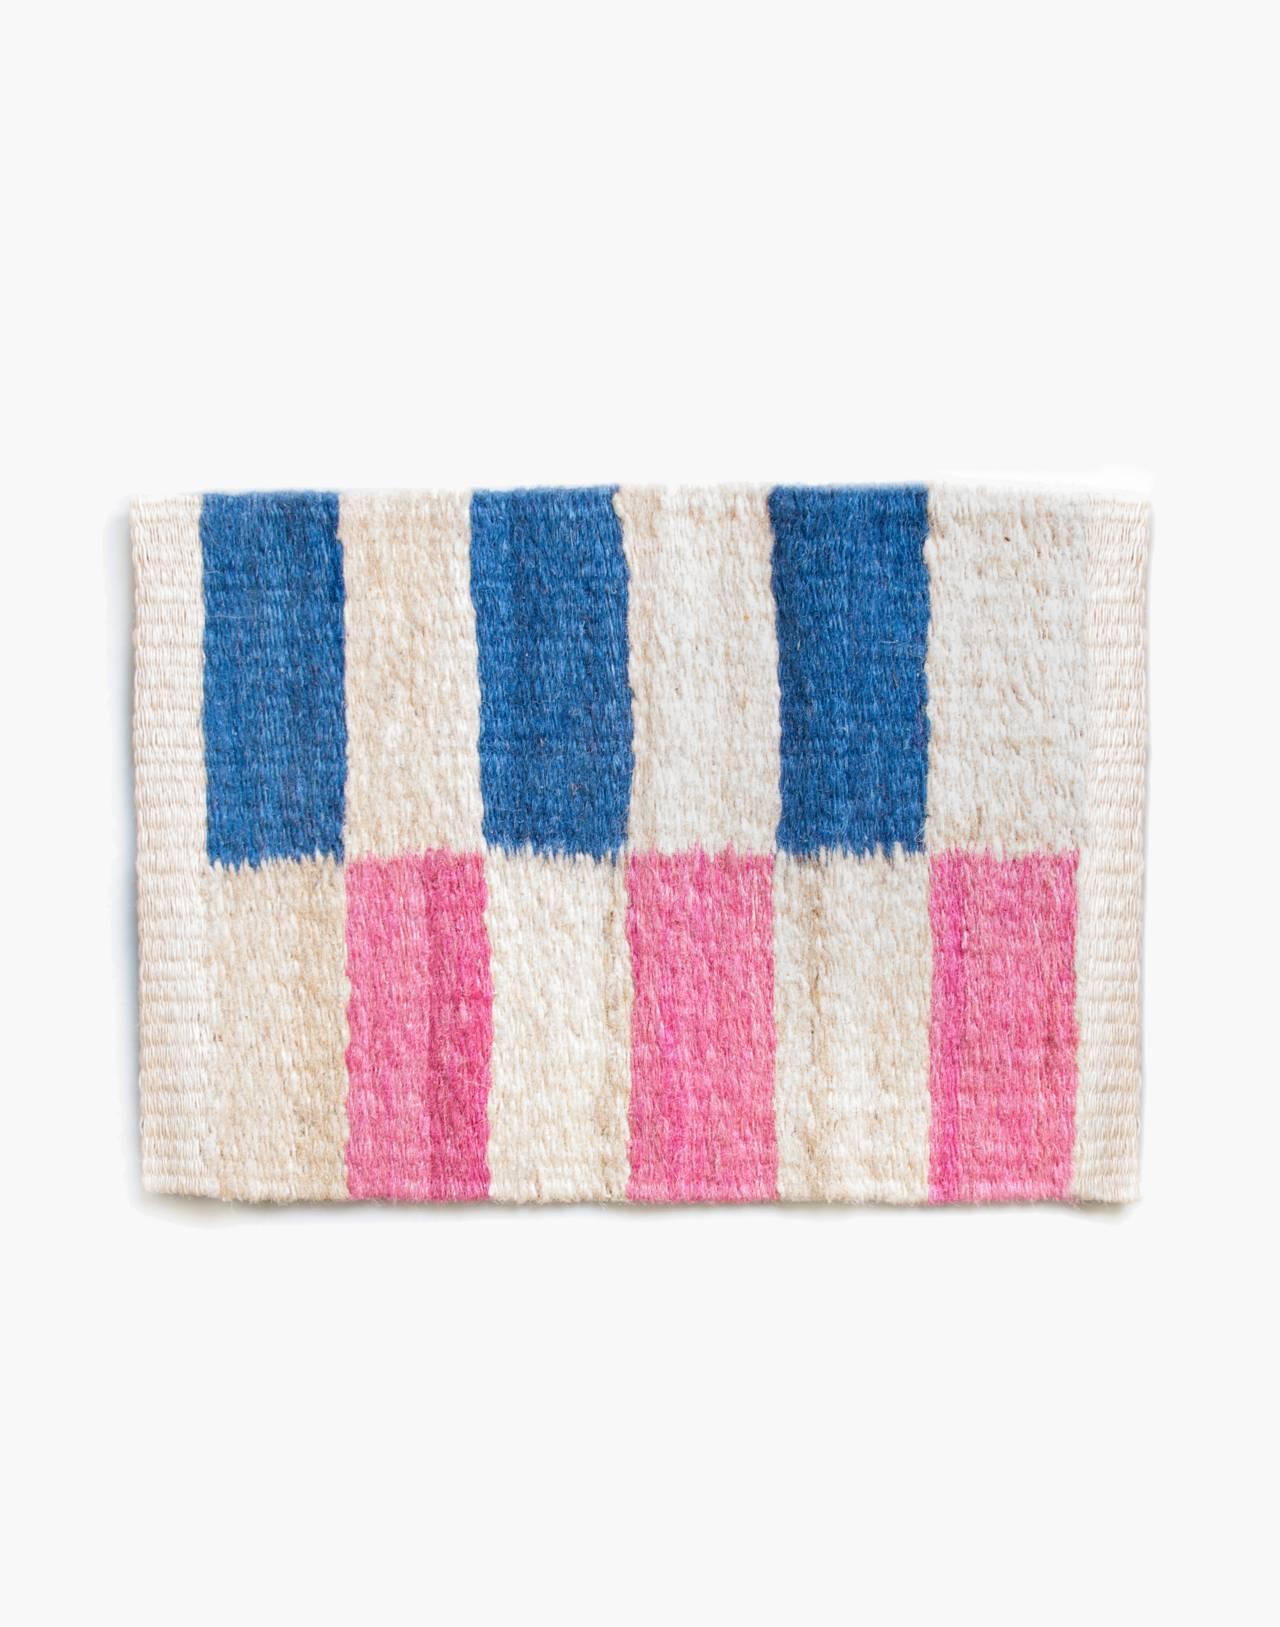 SOMEWARE™ Doli Doormat in pink image 2